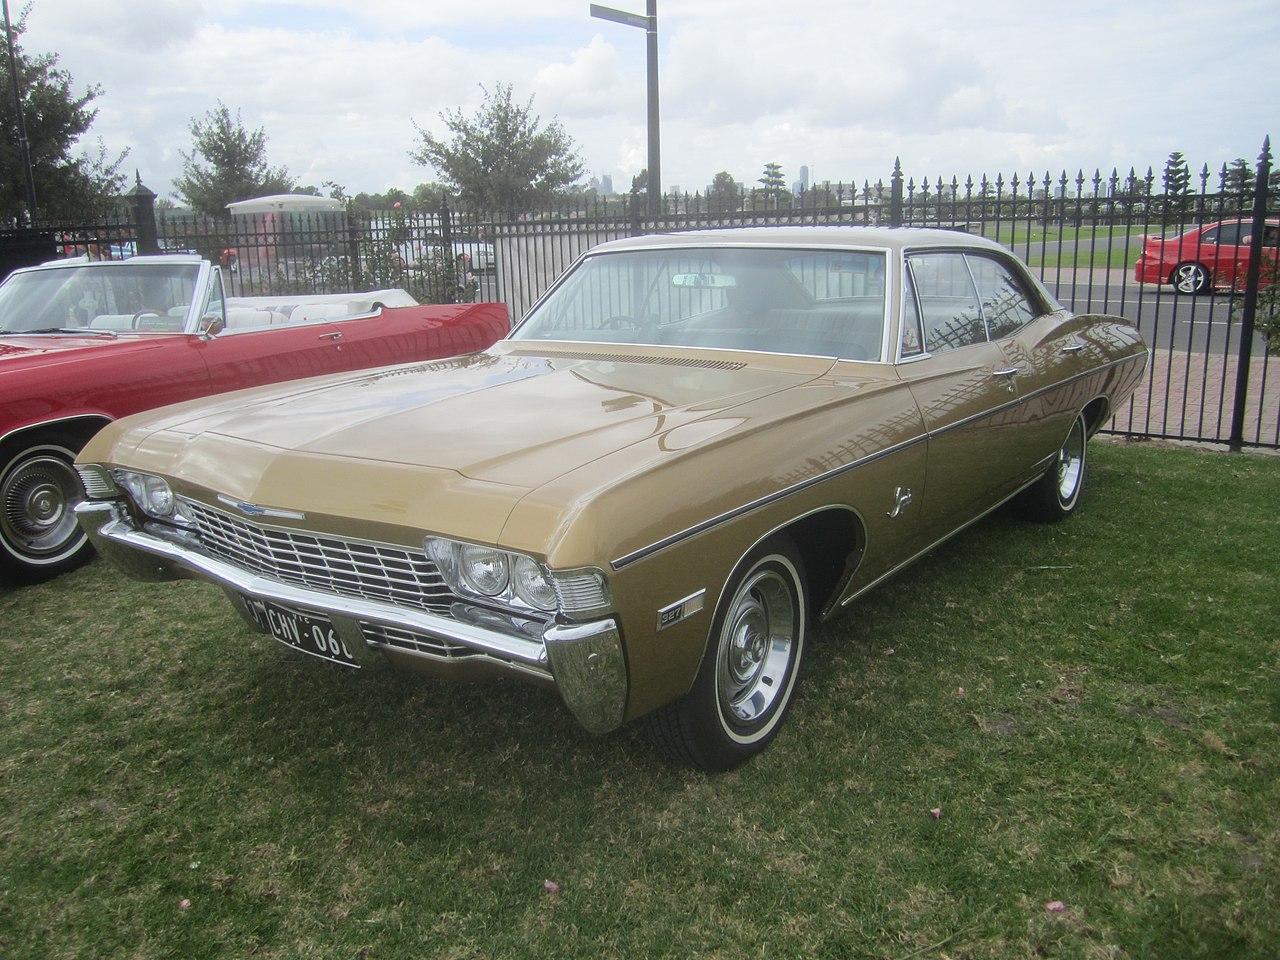 File 1968 Chevrolet Impala 4 Door Hardtop Jpg Wikimedia Commons